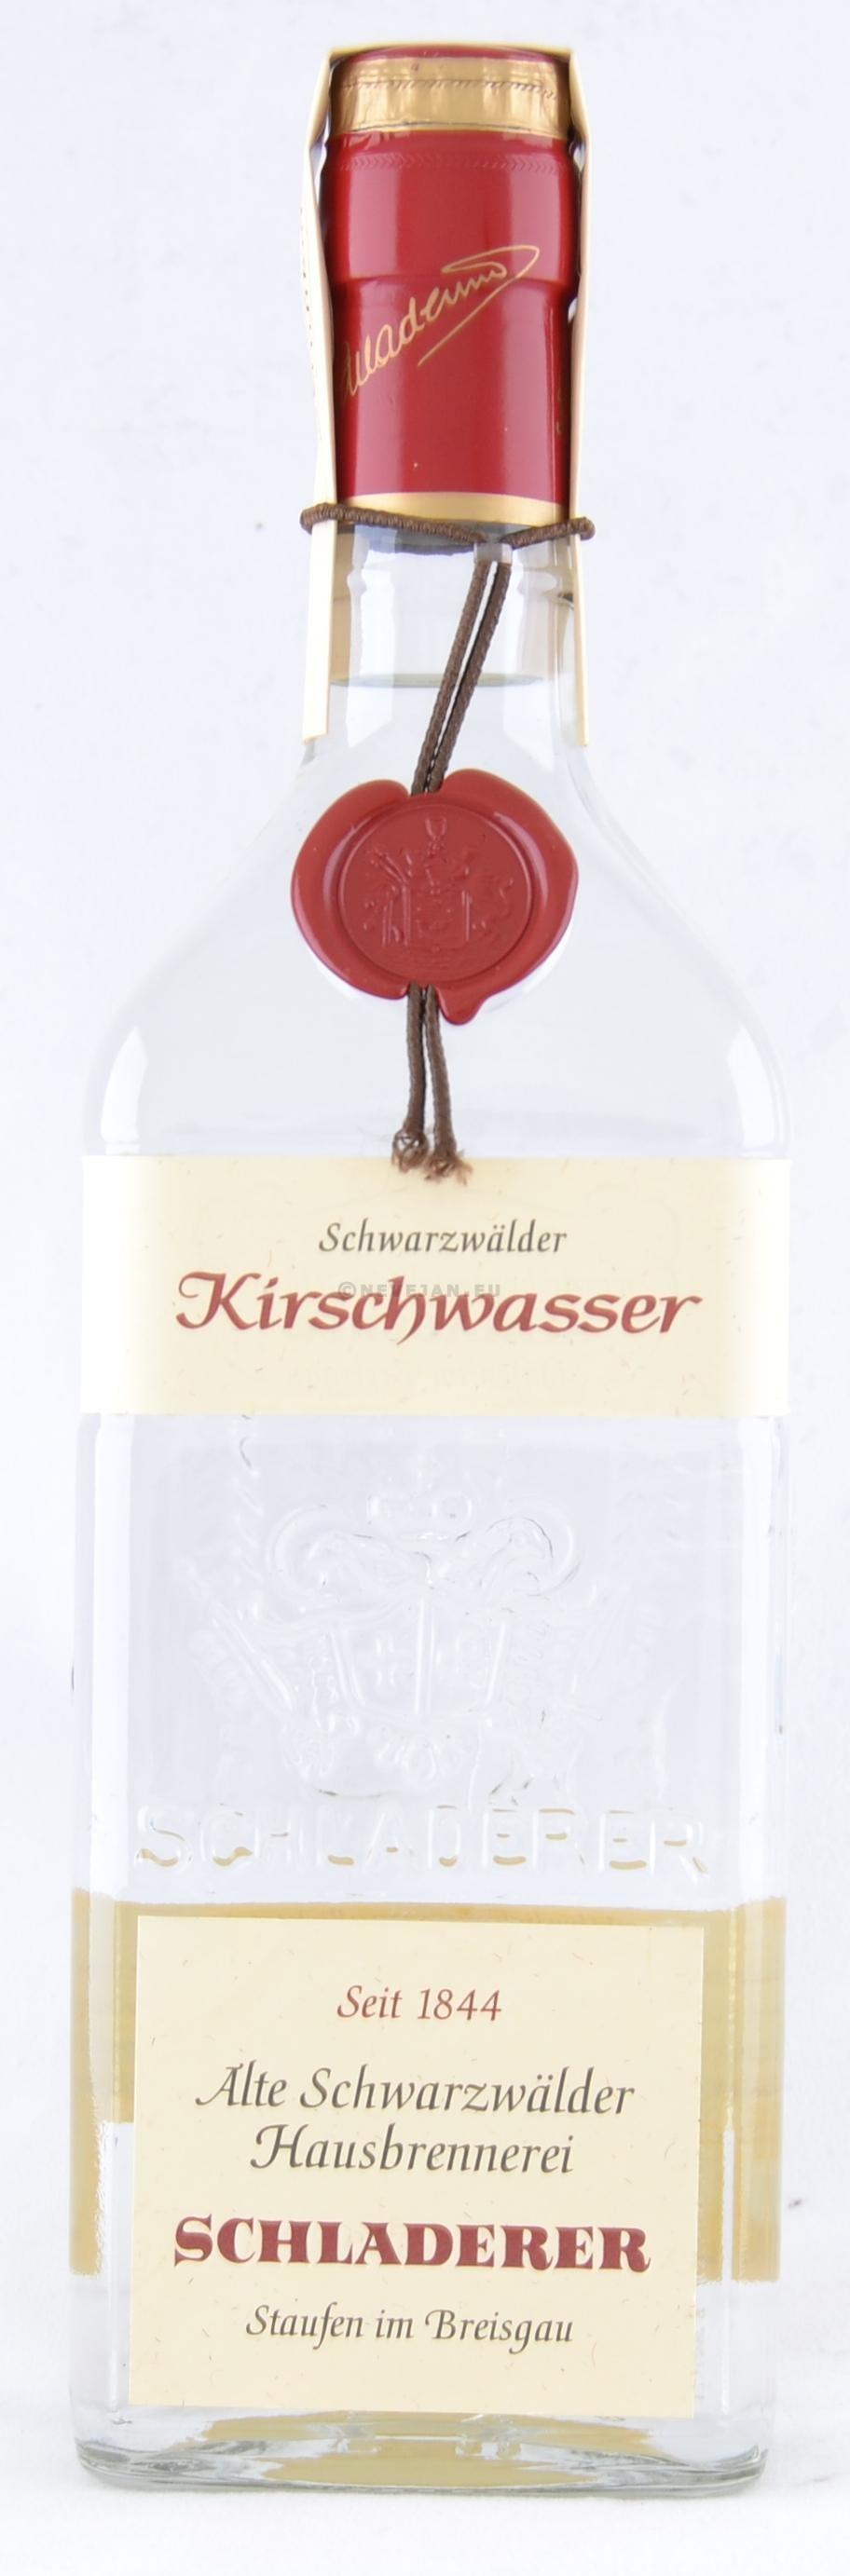 Eau de Vie Kirsch 70cl 40% Schladerer Kirschwasser